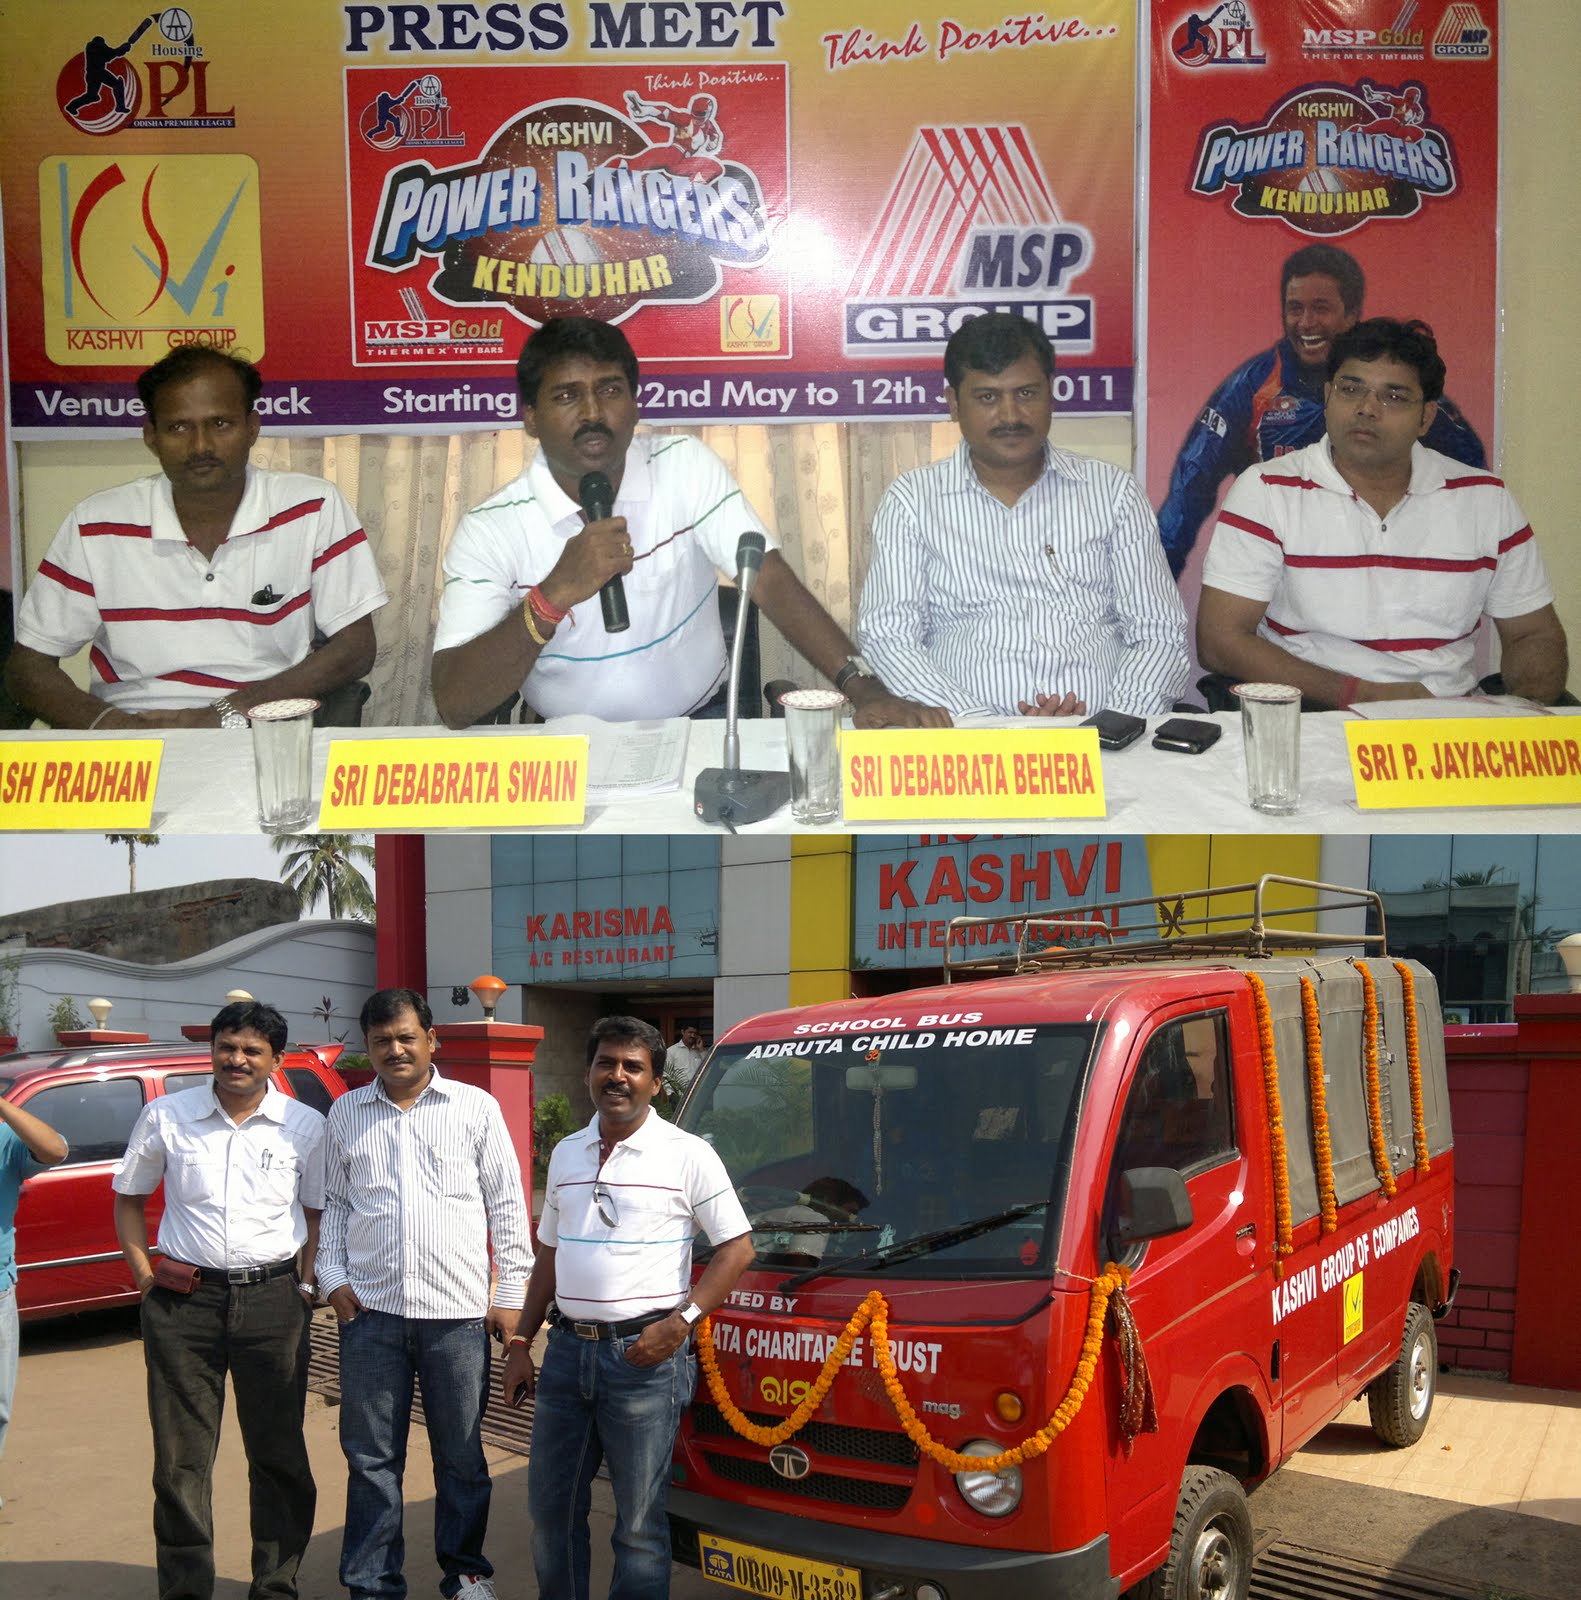 Hotel Kashvi Kashvi Power Rangers Keonjhar Logo Orissa Premiere League Trophy